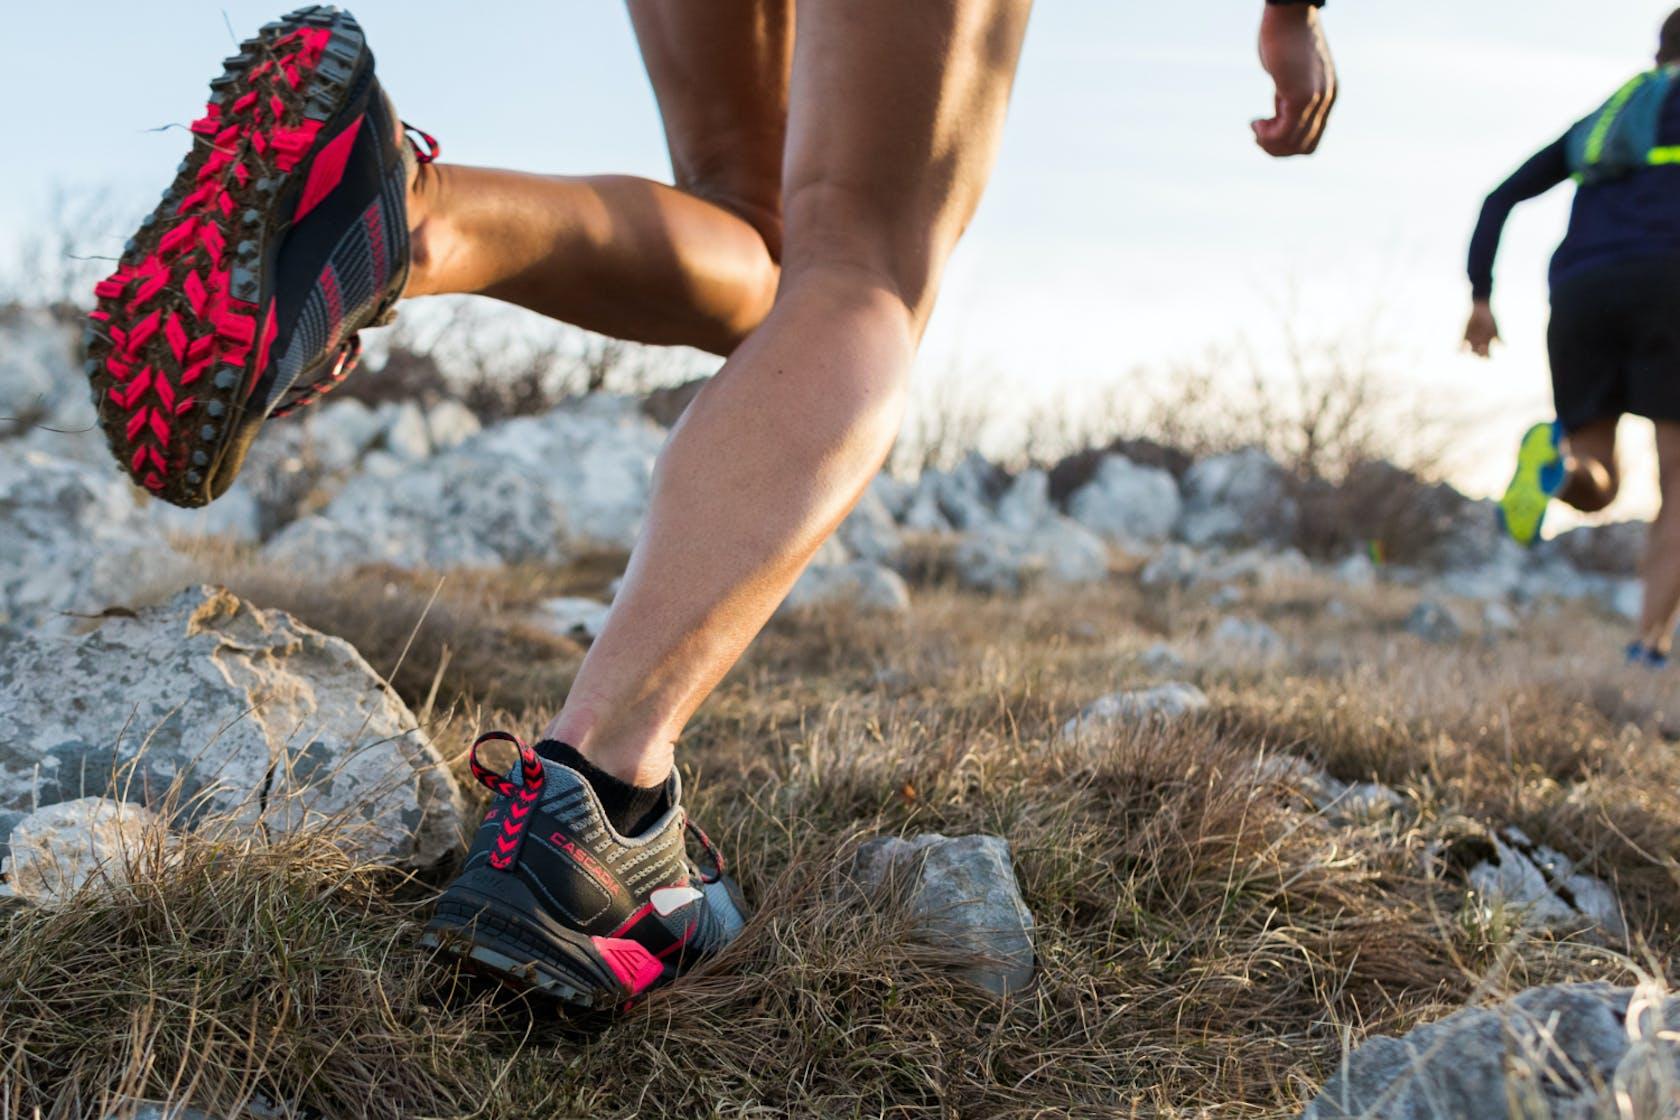 Trailrunning | Onlineshop Bekleidung Ausruestung Schuhe